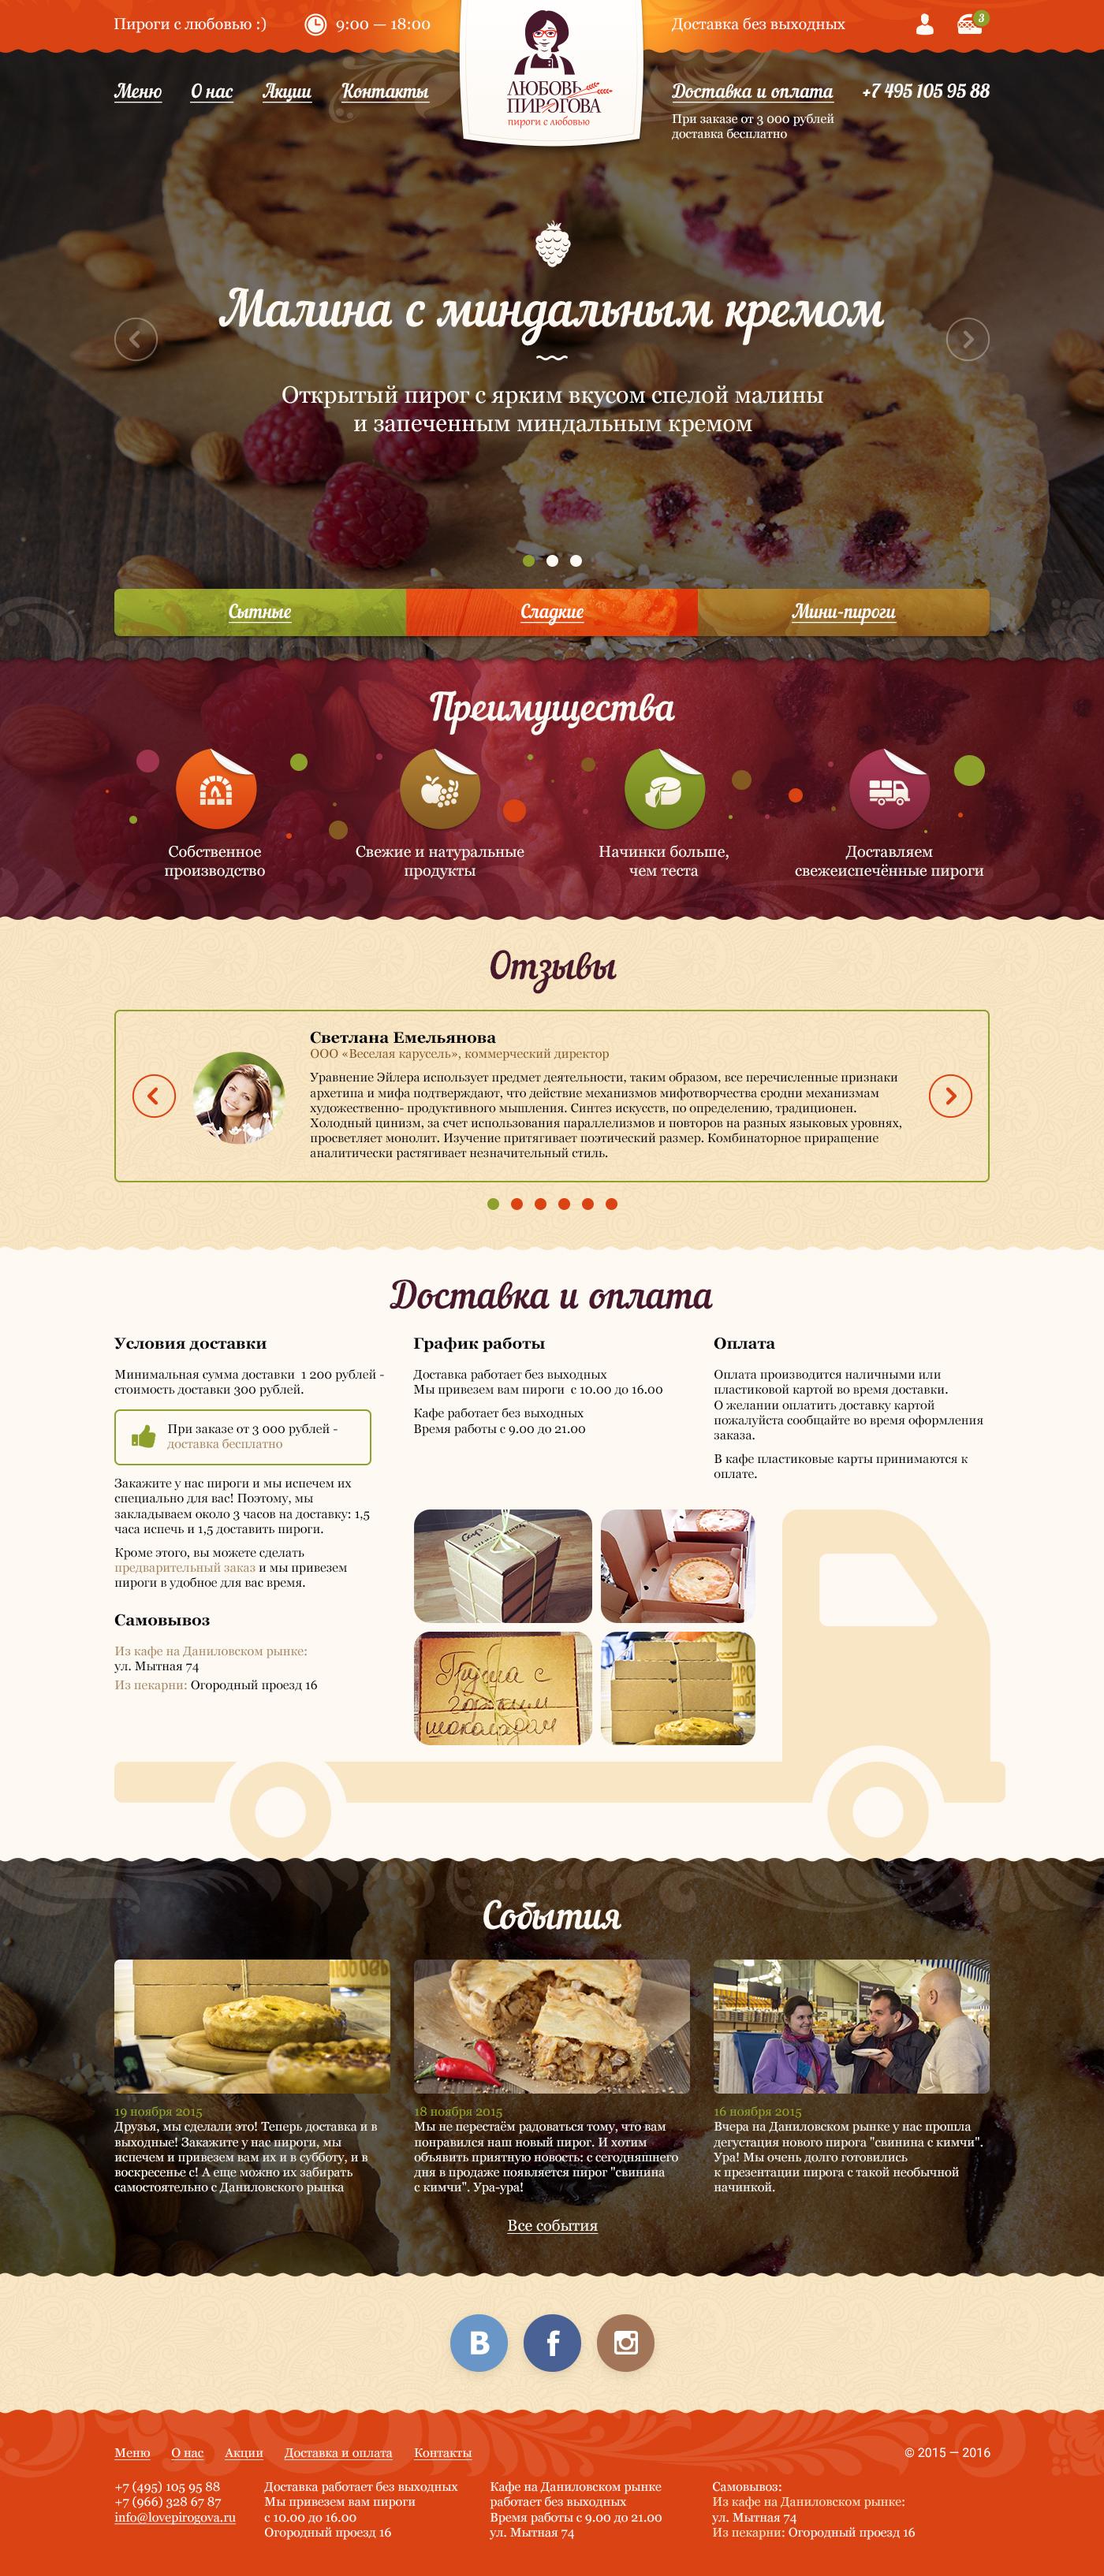 Разработка дизайна сайта lovepirogova.ru фото f_20356b7a759233b6.jpg